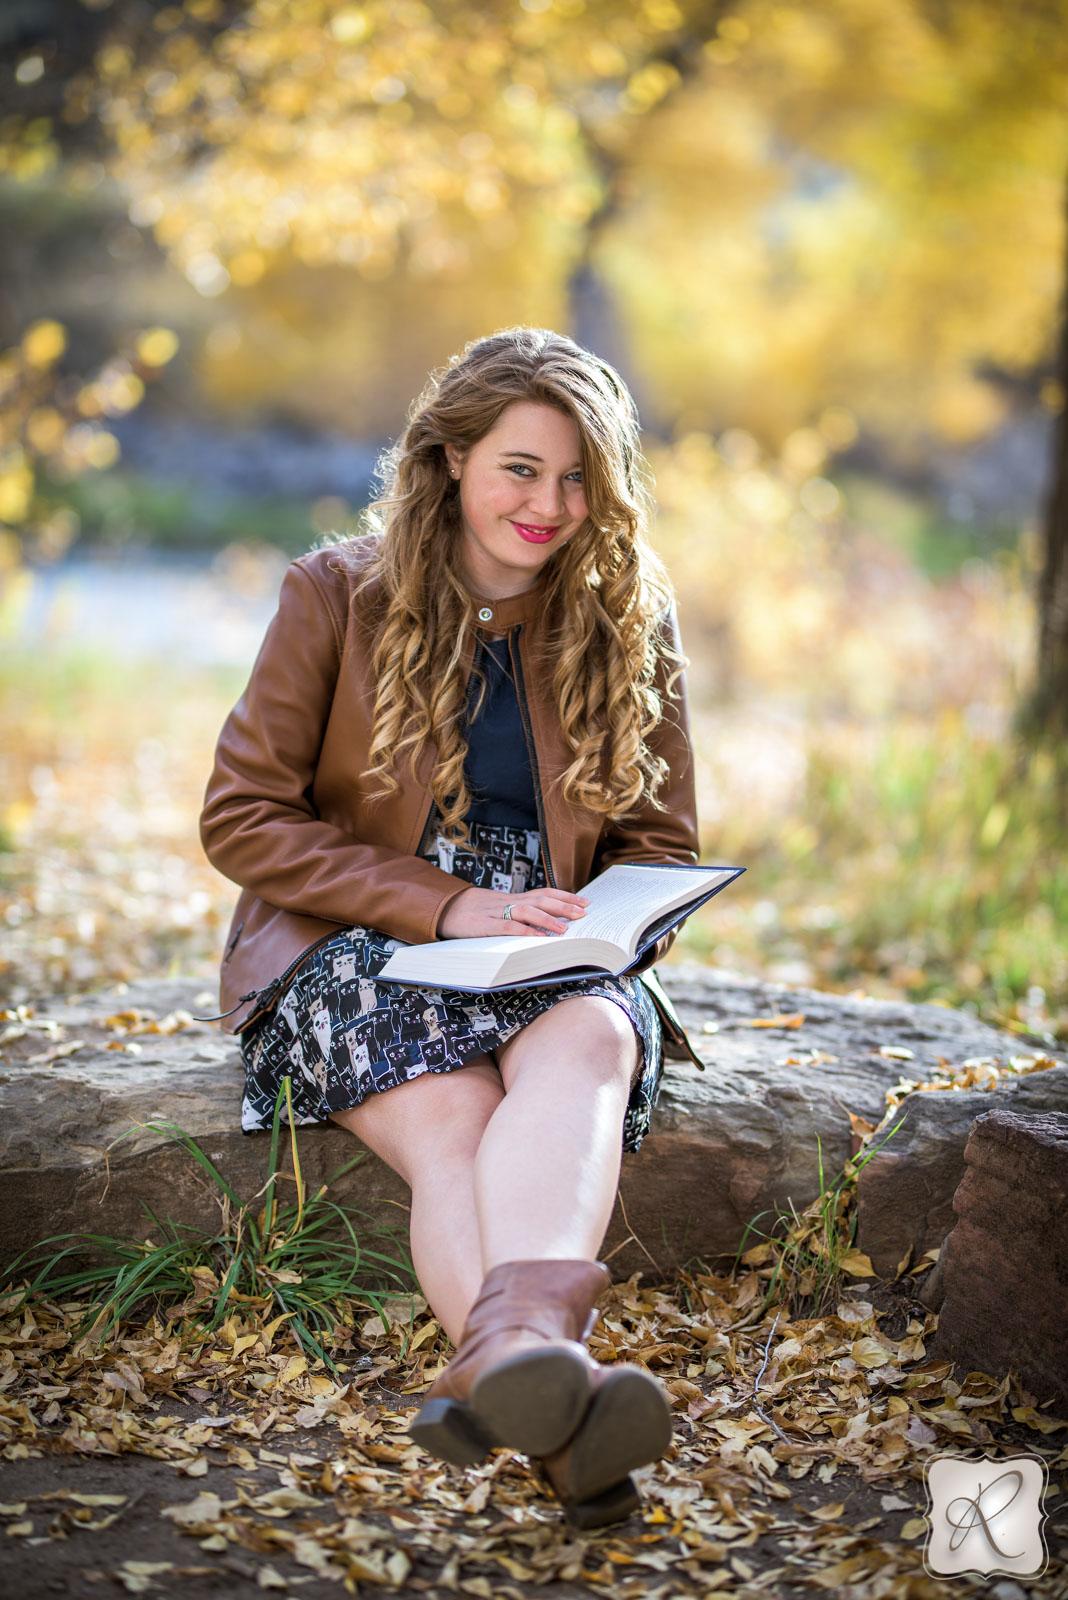 Allison Ragsdale Photography seniors